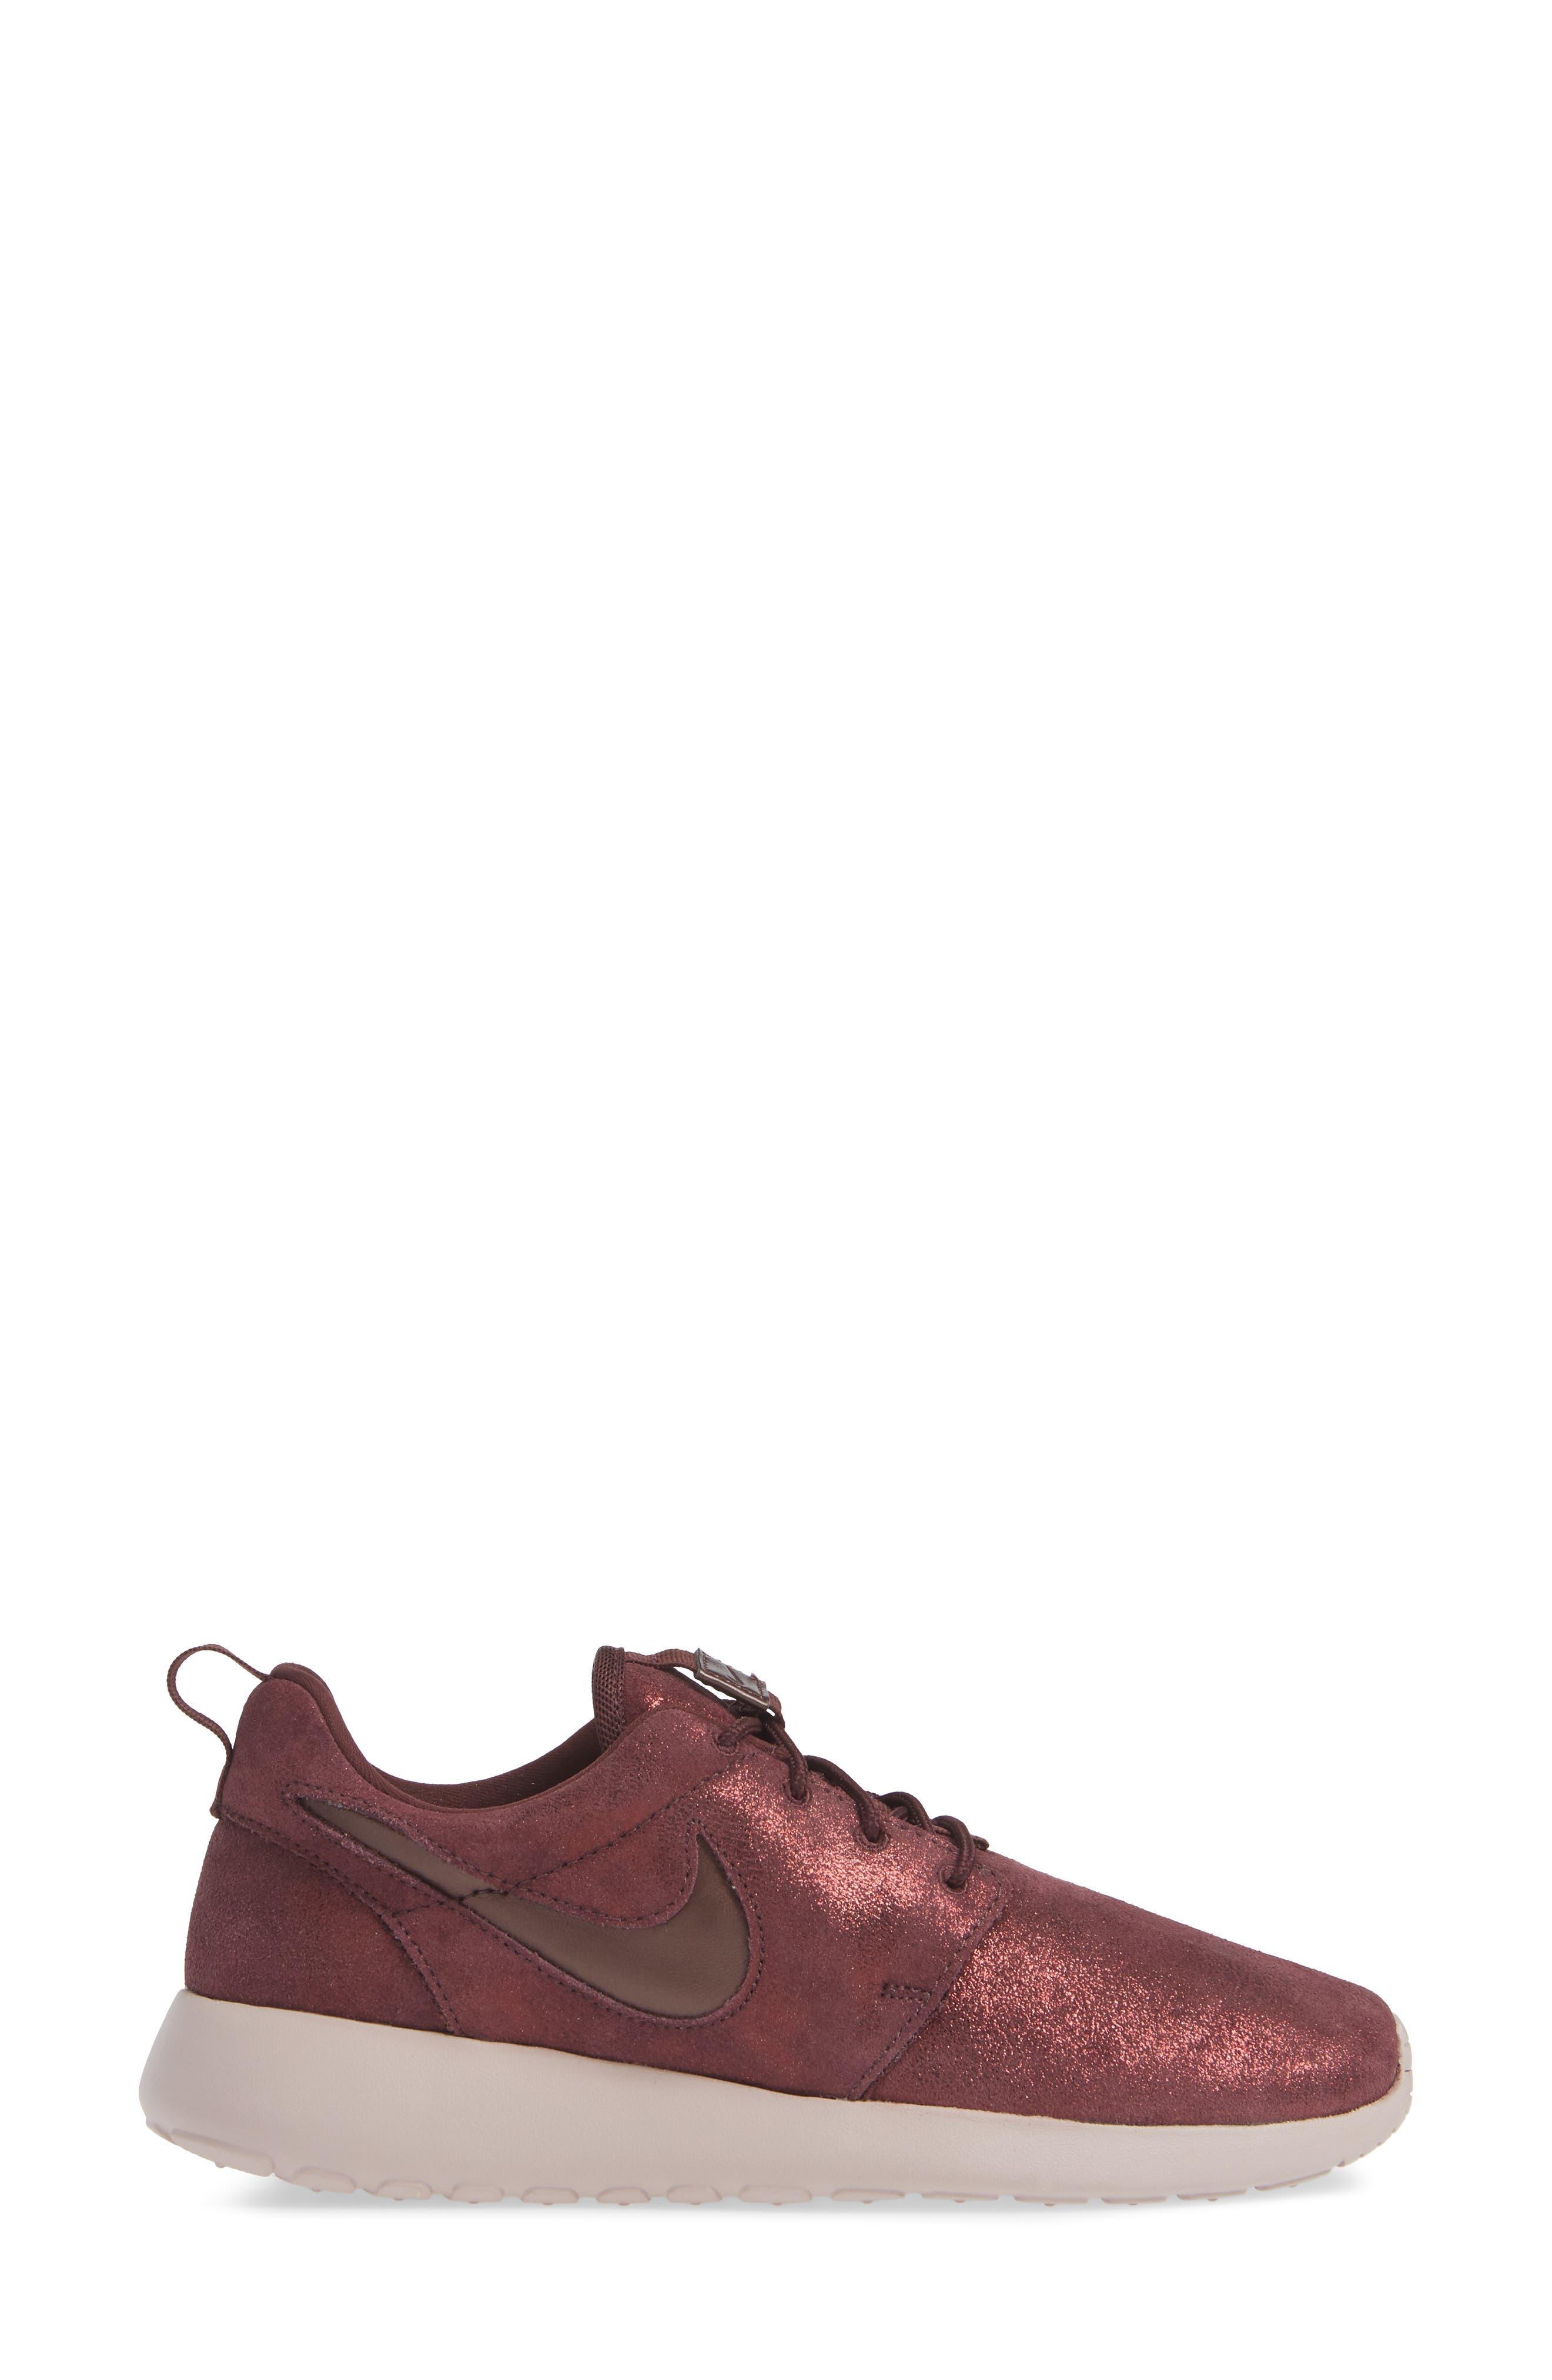 'Roshe Run' Print Sneaker,                             Alternate thumbnail 3, color,                             METALLIC MAHOGANY/ MAHOGANY